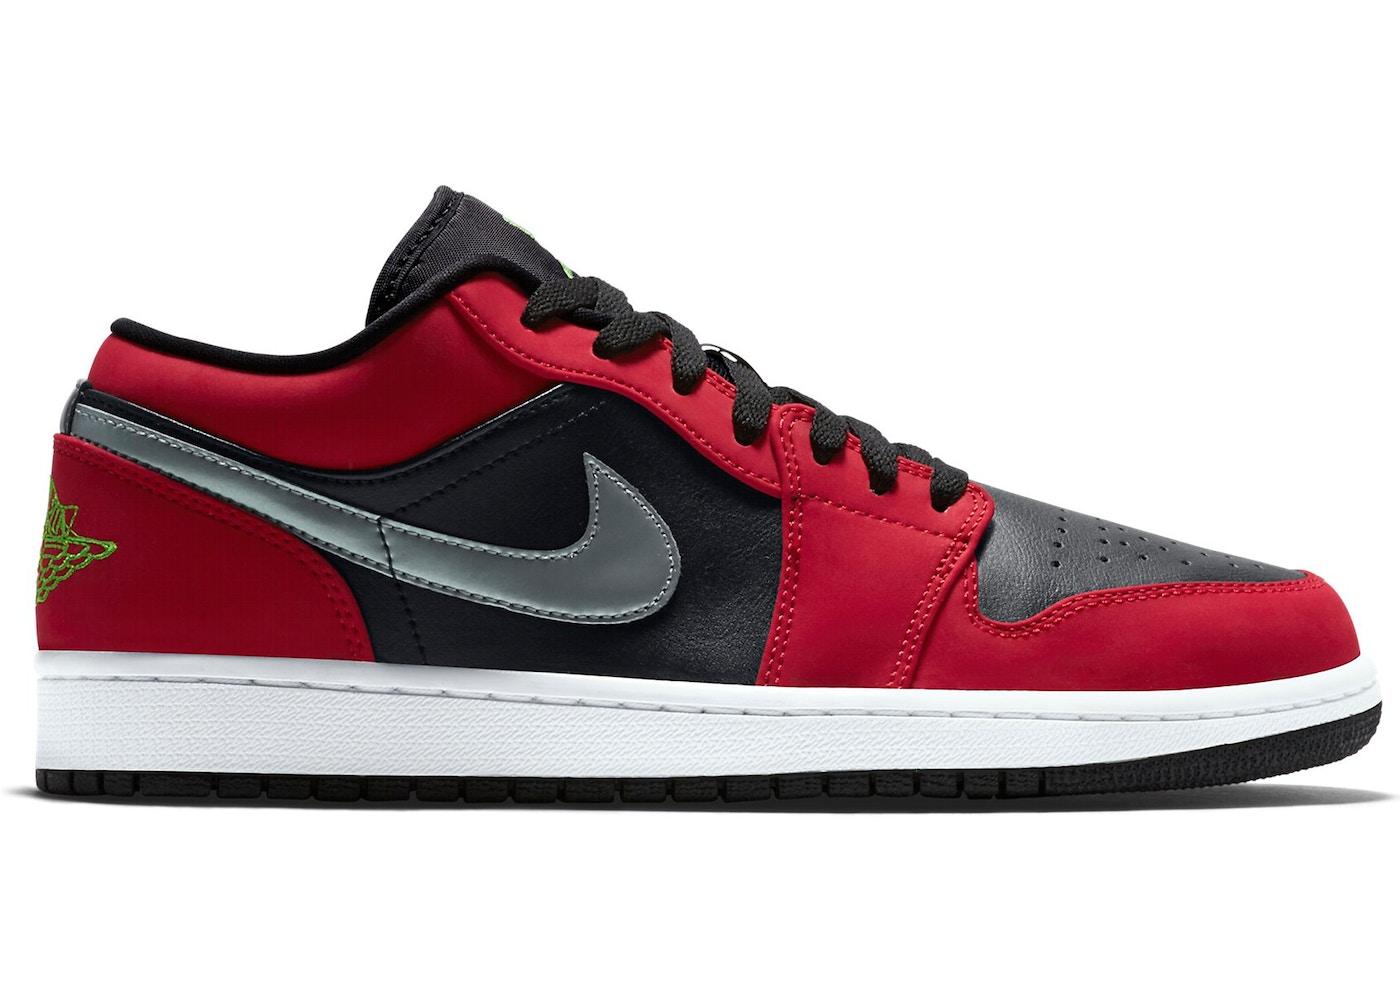 Jordan 1 Low Black Green Pulse Gym Red 553558 036